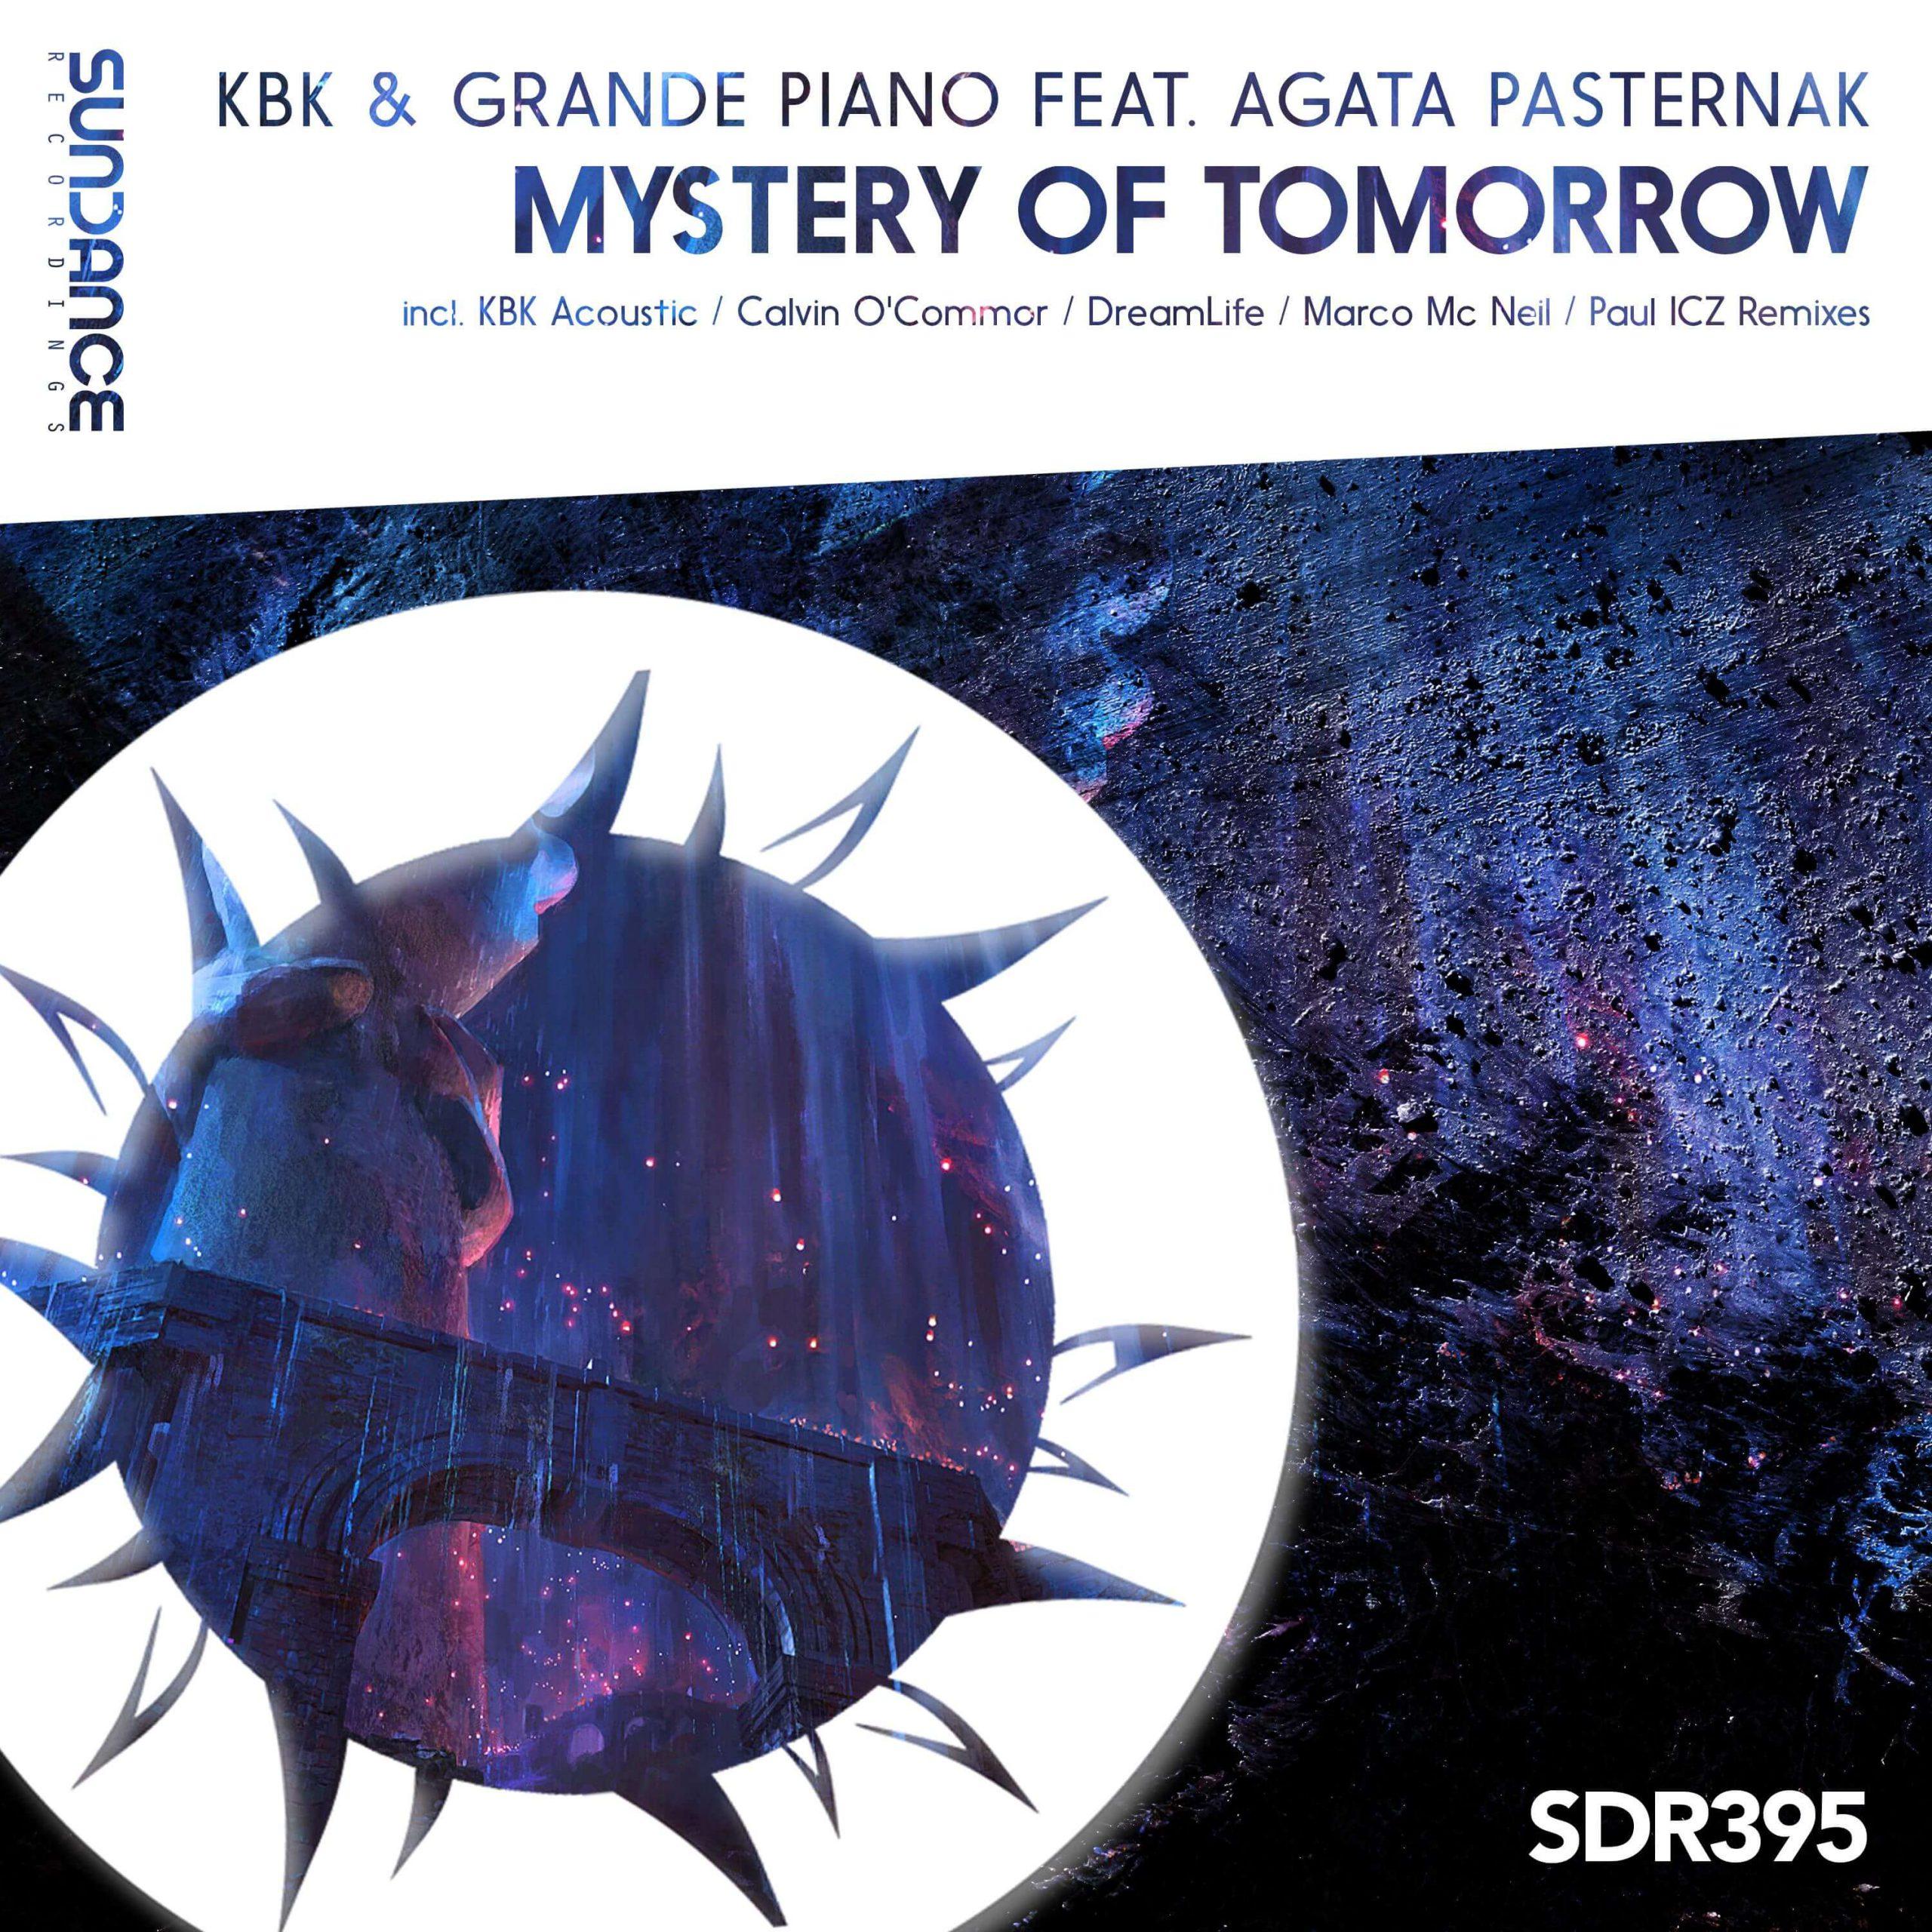 KBK & Grande Piano Feat. Agata Pasternak – Mystery Of Tomorrow (DreamLife Remix)